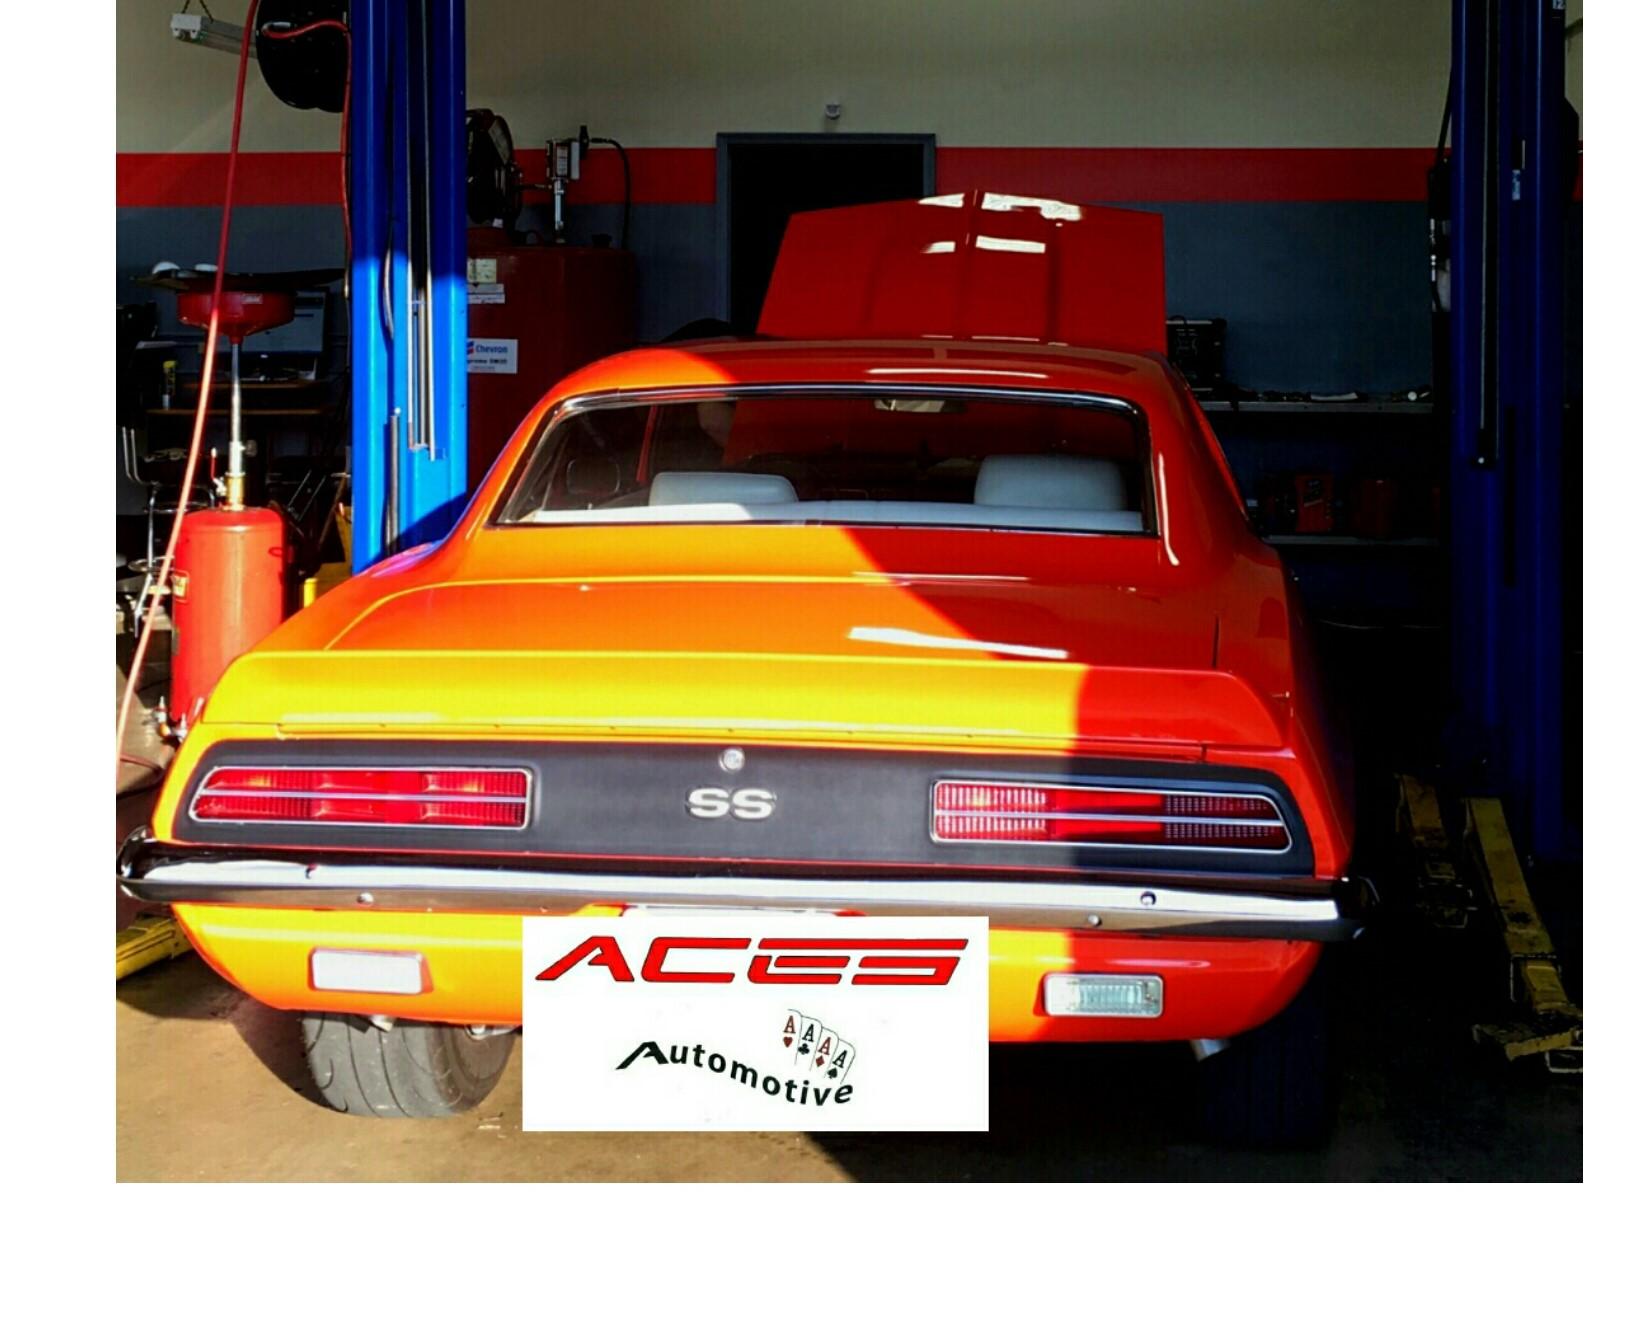 Auto repair services in Indian Trail, North Carolina